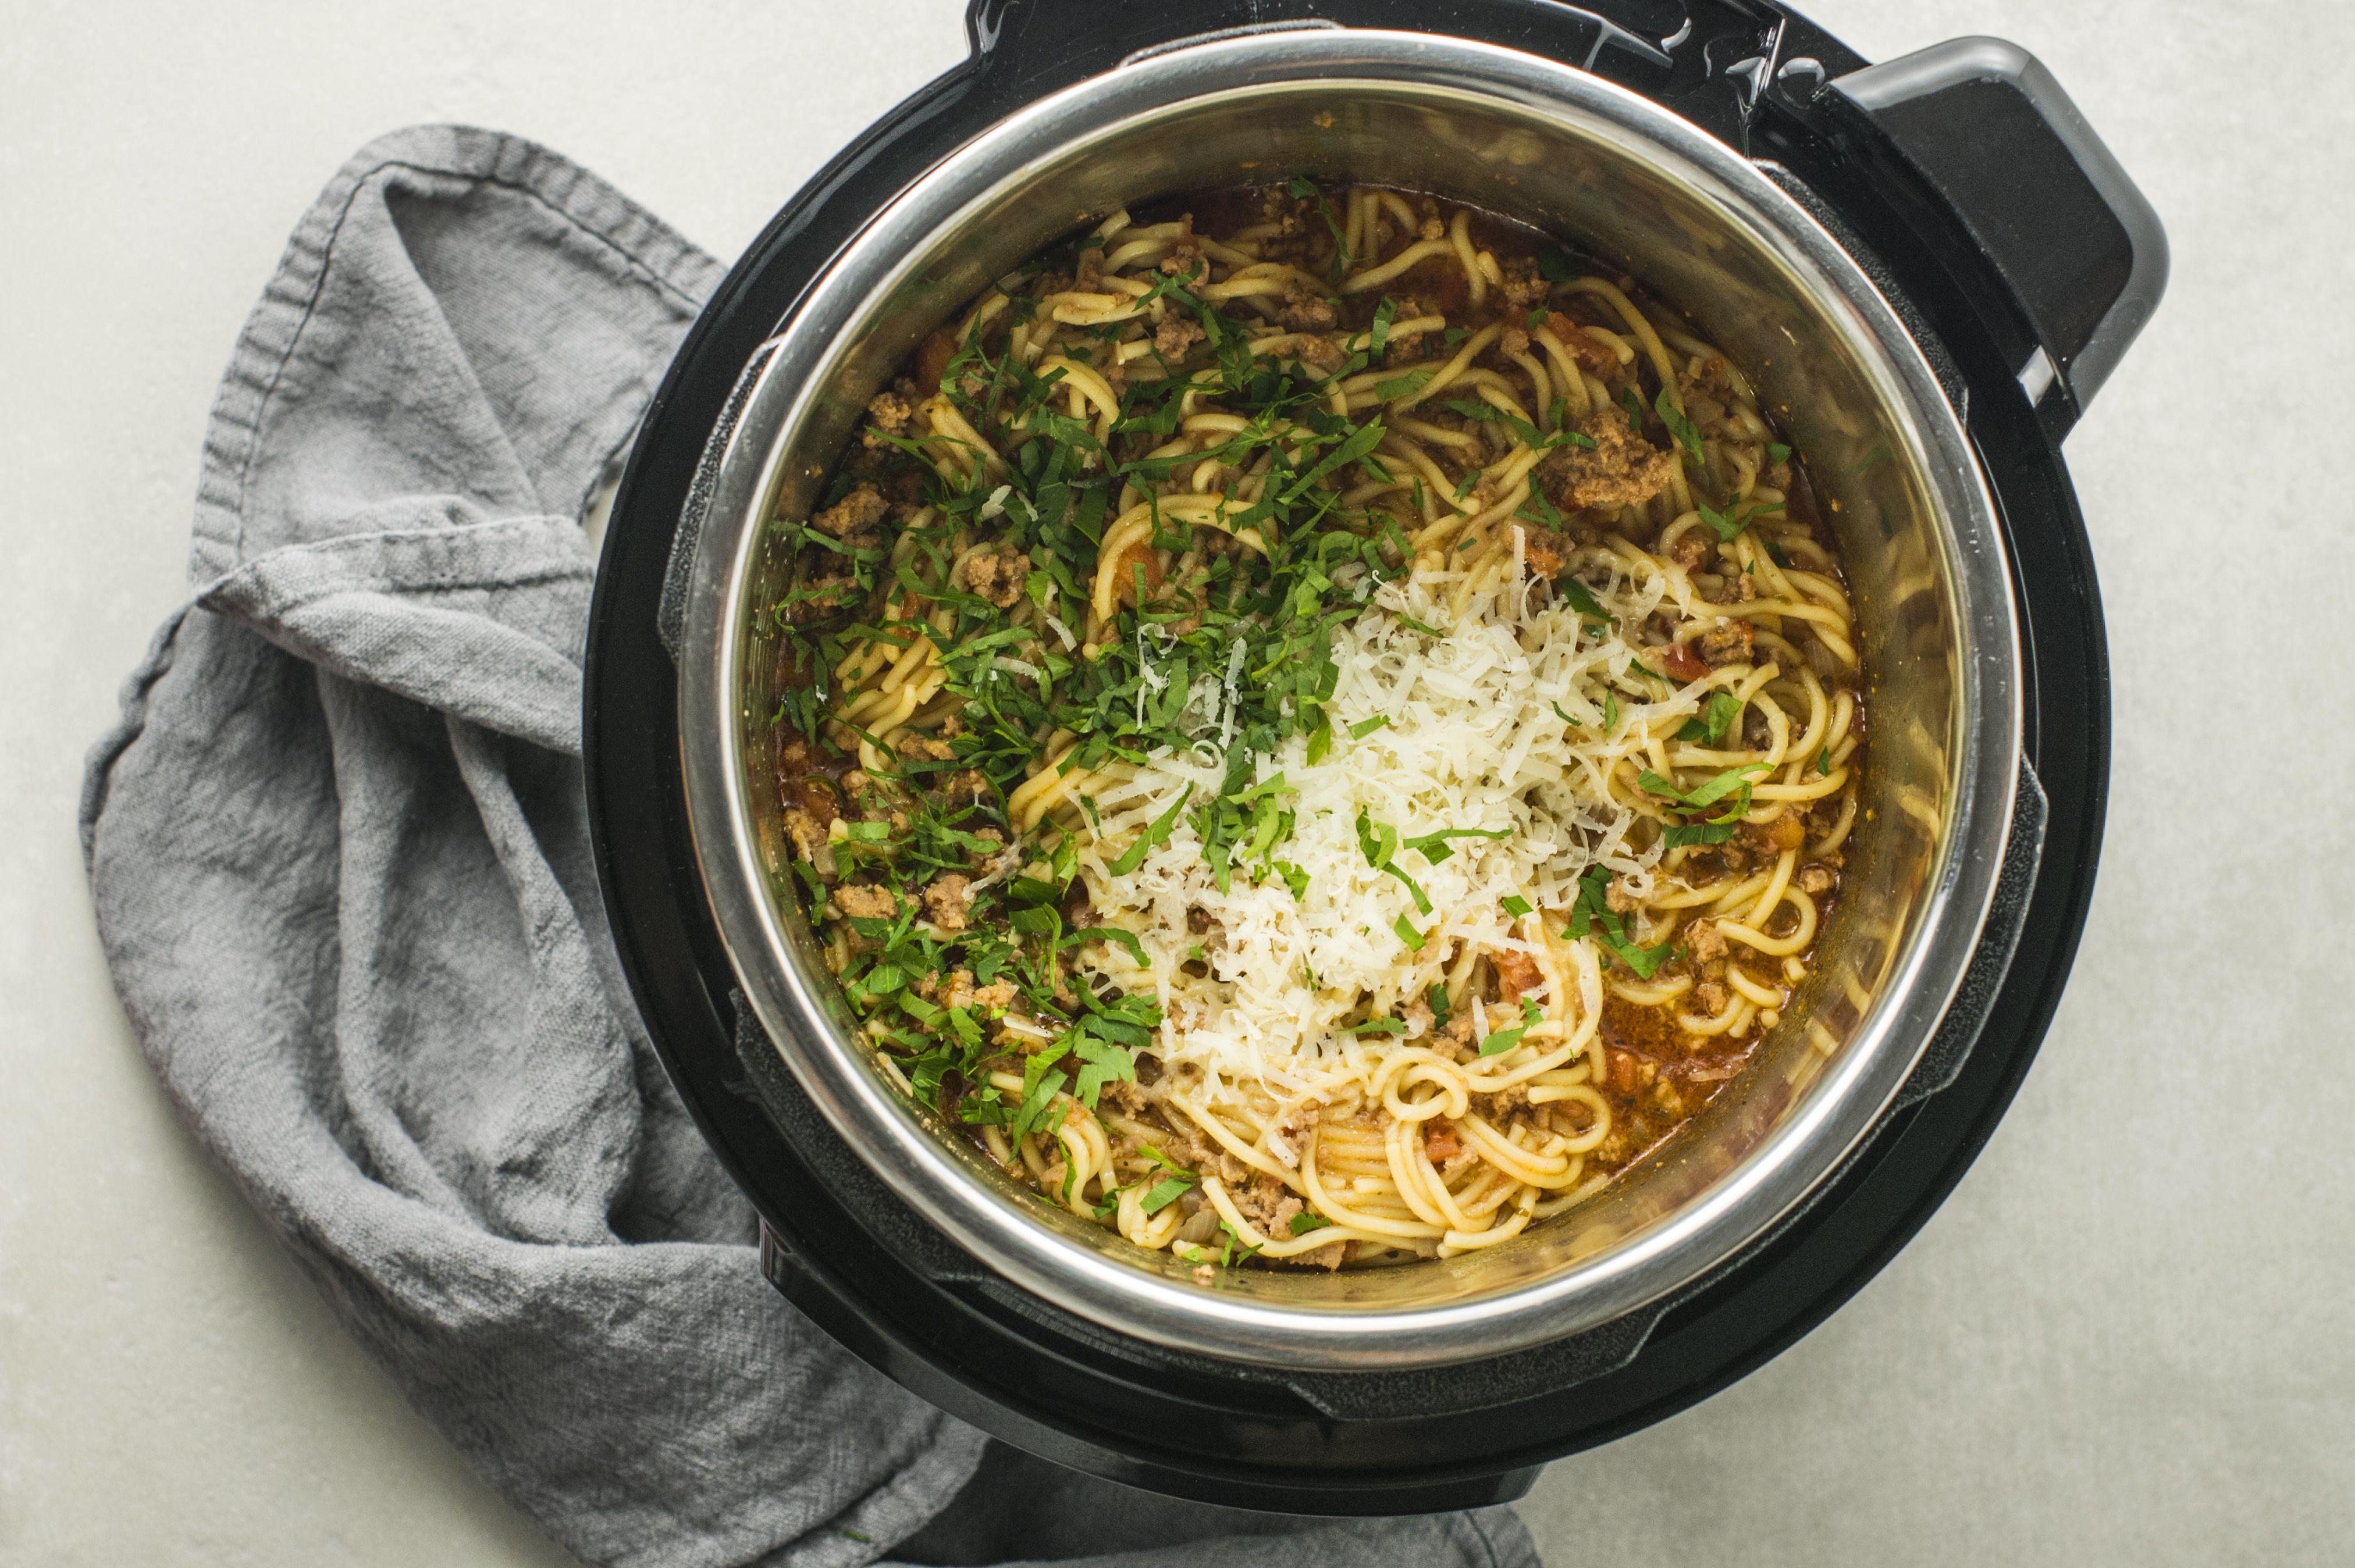 Stir the spaghetti and sauce